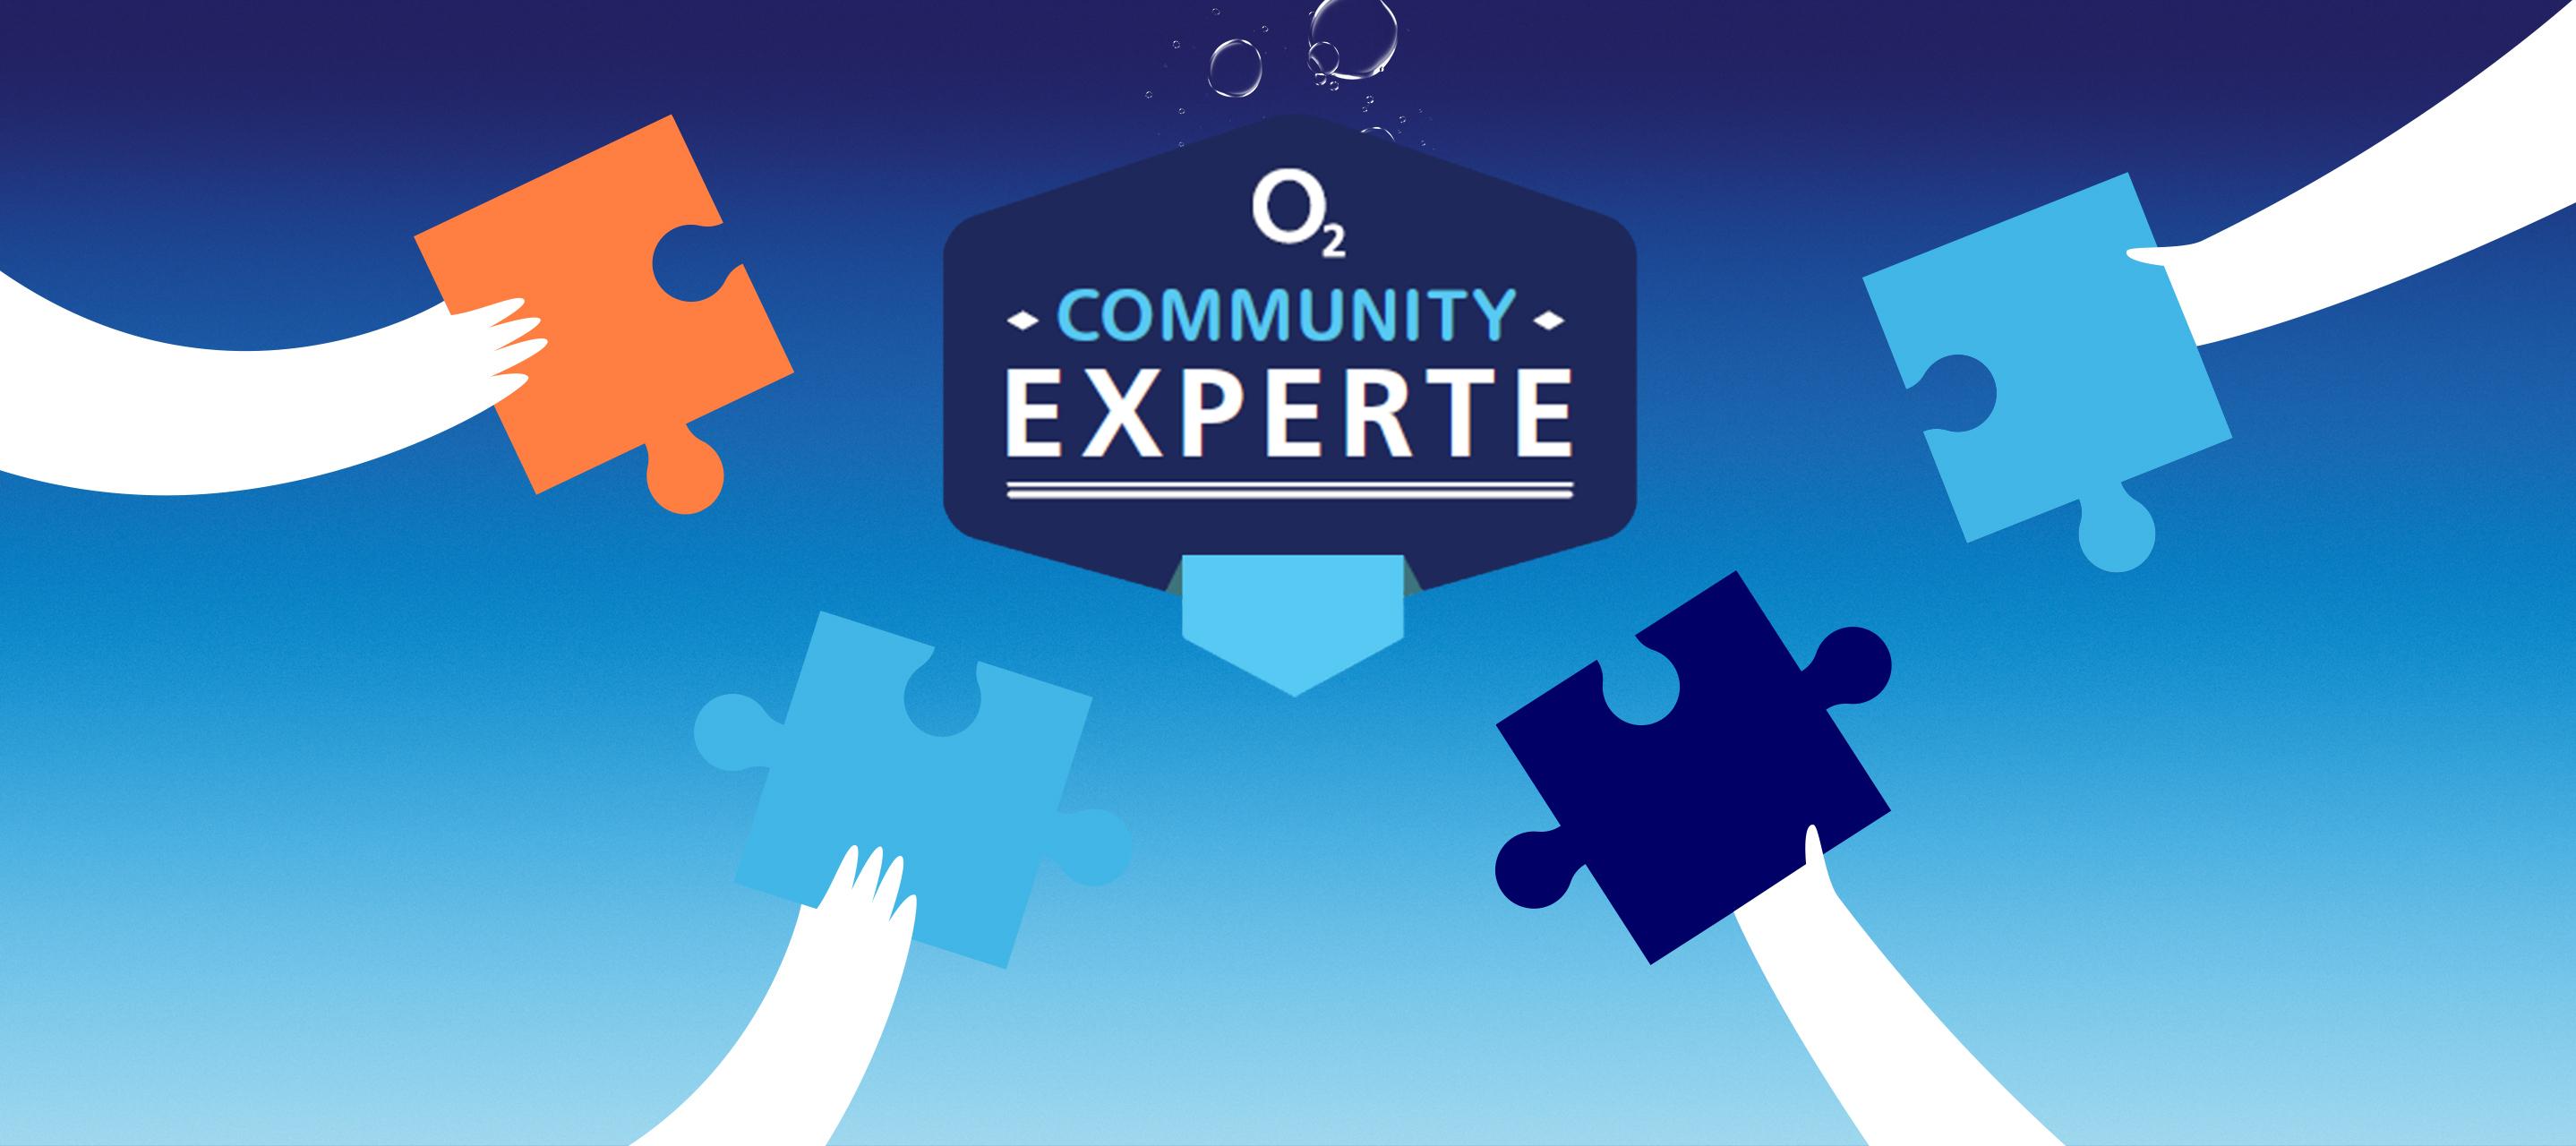 Unsere O₂ Community Expert:innen erhalten Verstärkung